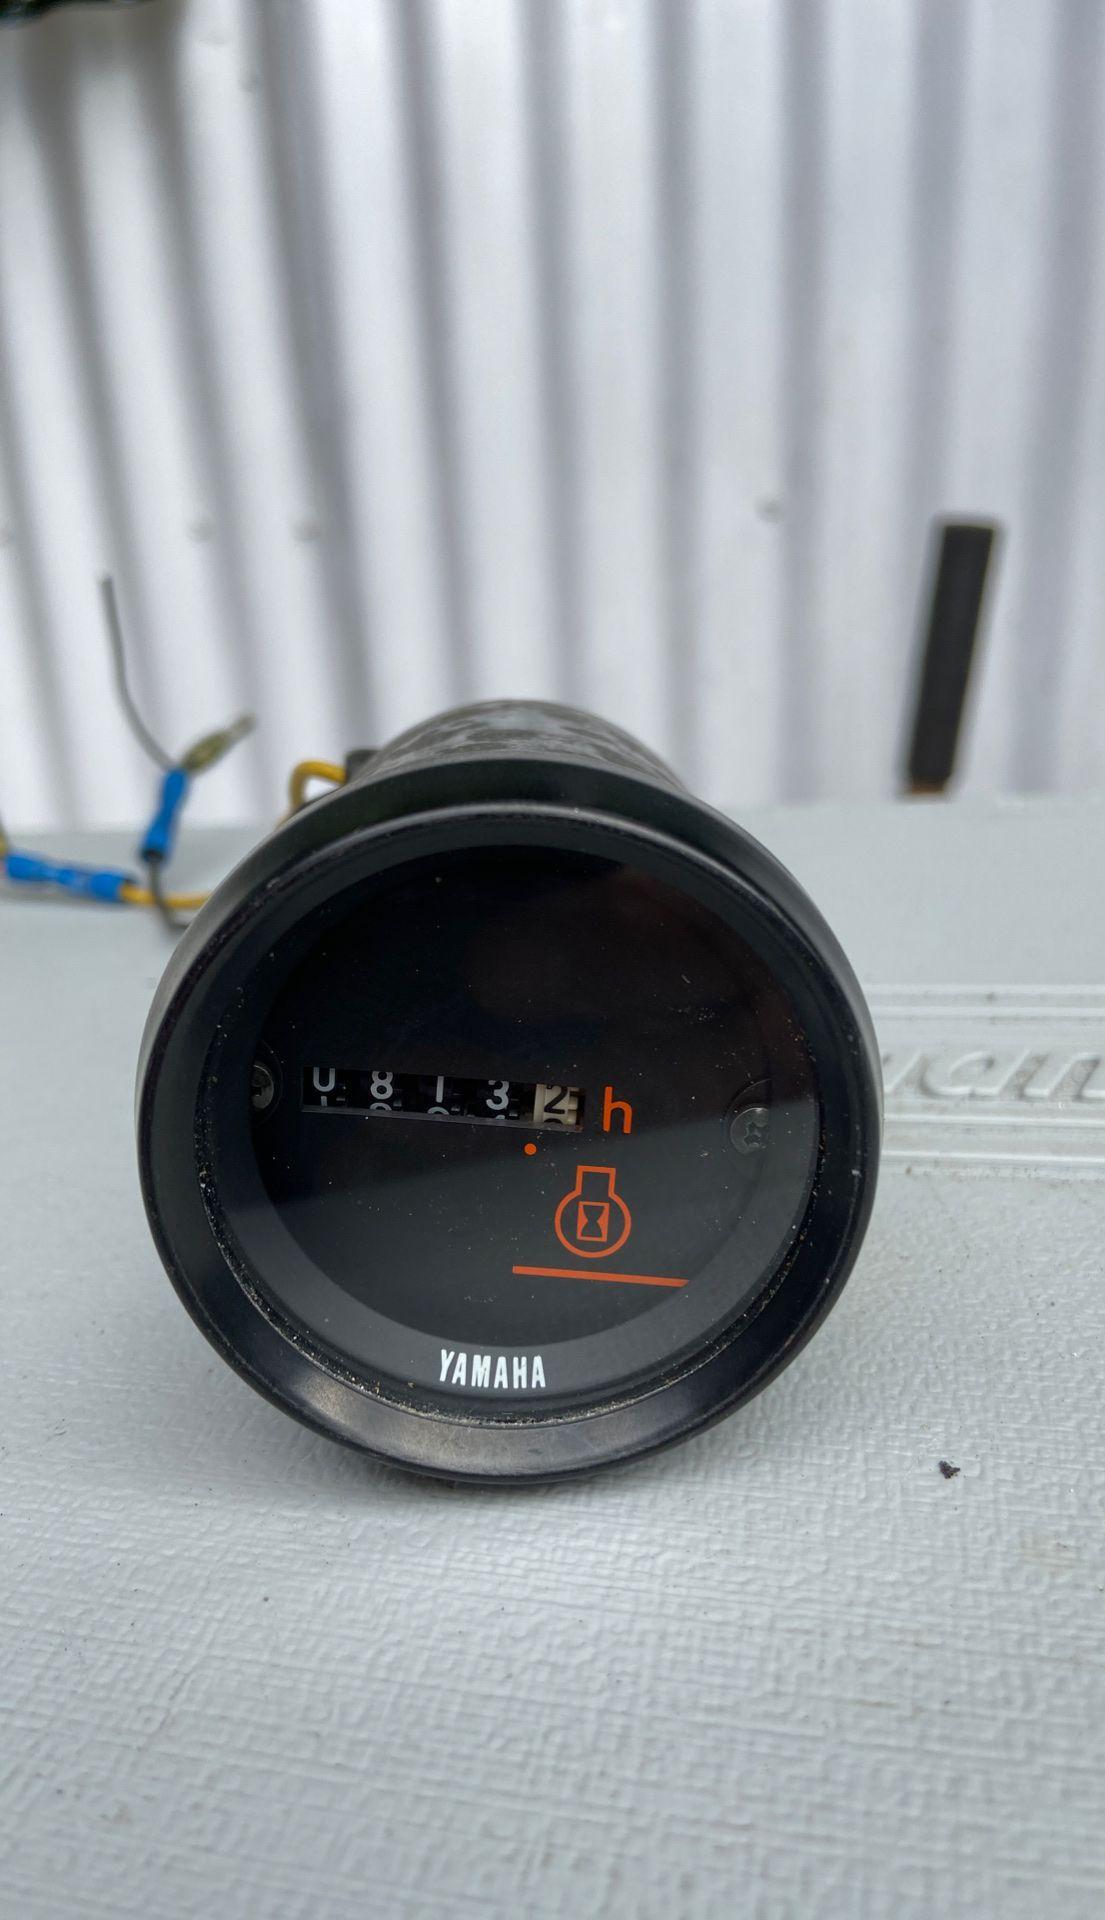 Yamaha hours gauge